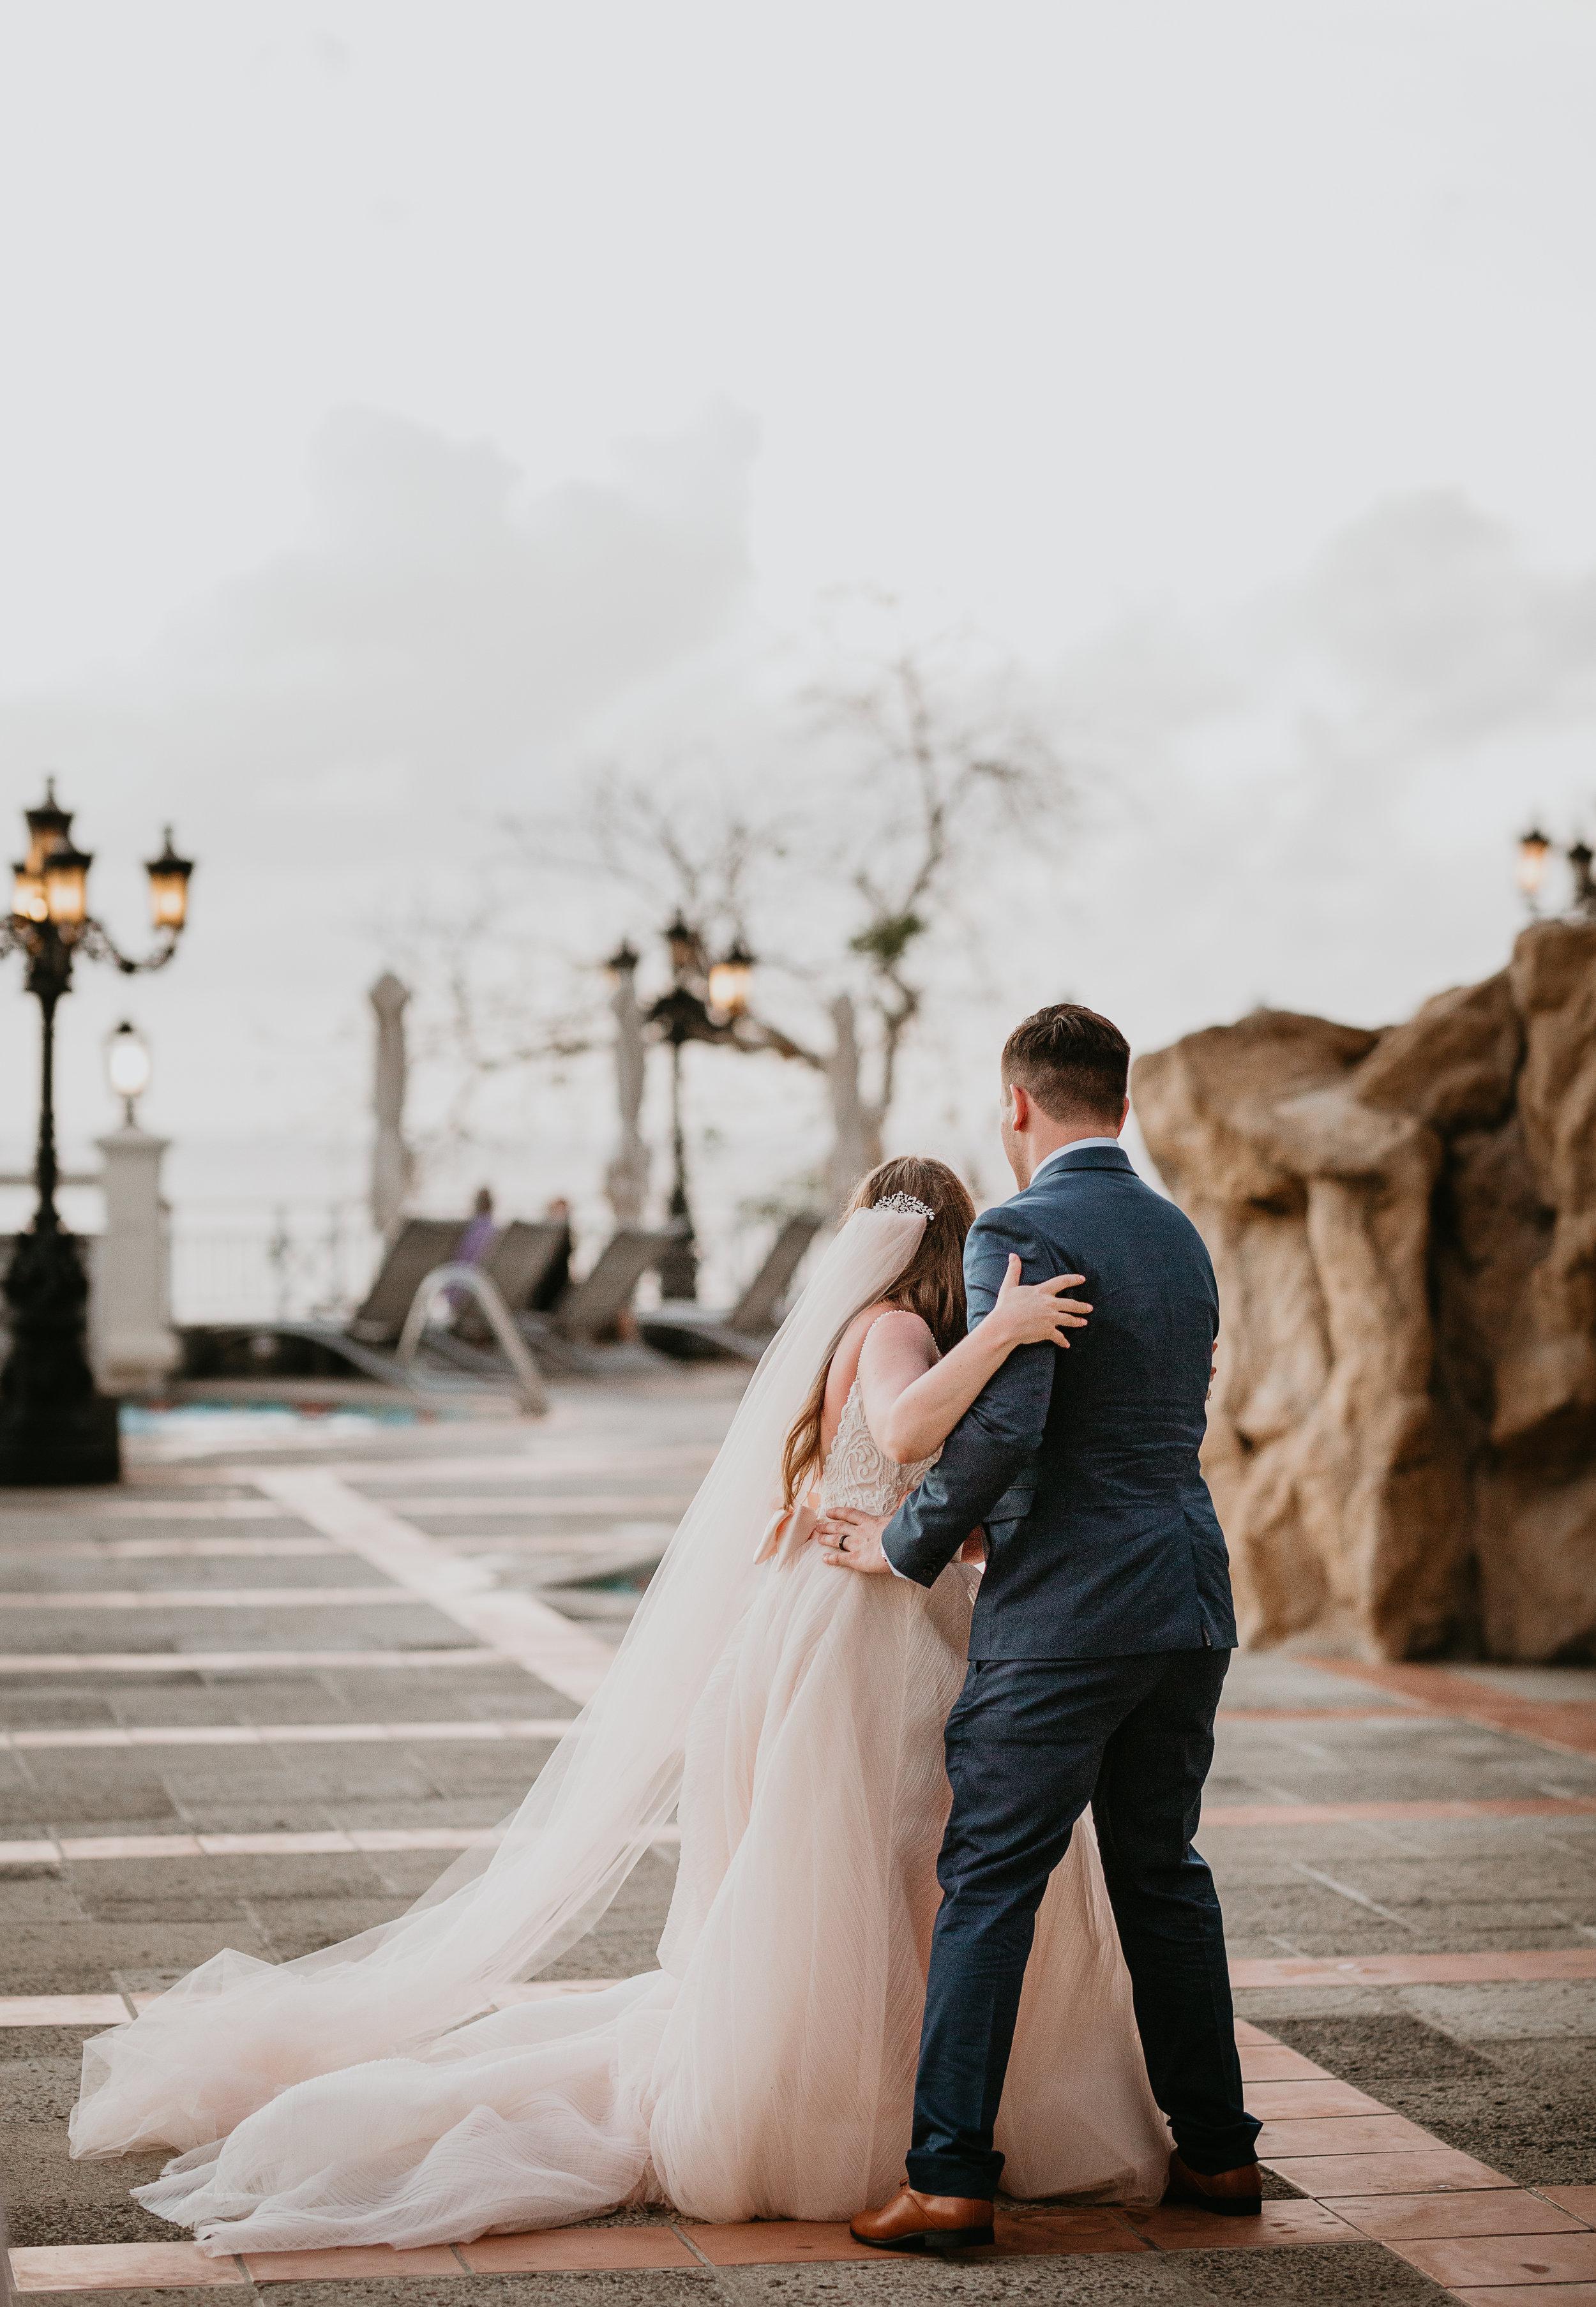 nicole-daacke-photography-destination-wedding-in-st-lucia-sandals-la-toc-intimate-island-wedding-carribean-elopement-photographer-chill-island-wedding-131.jpg